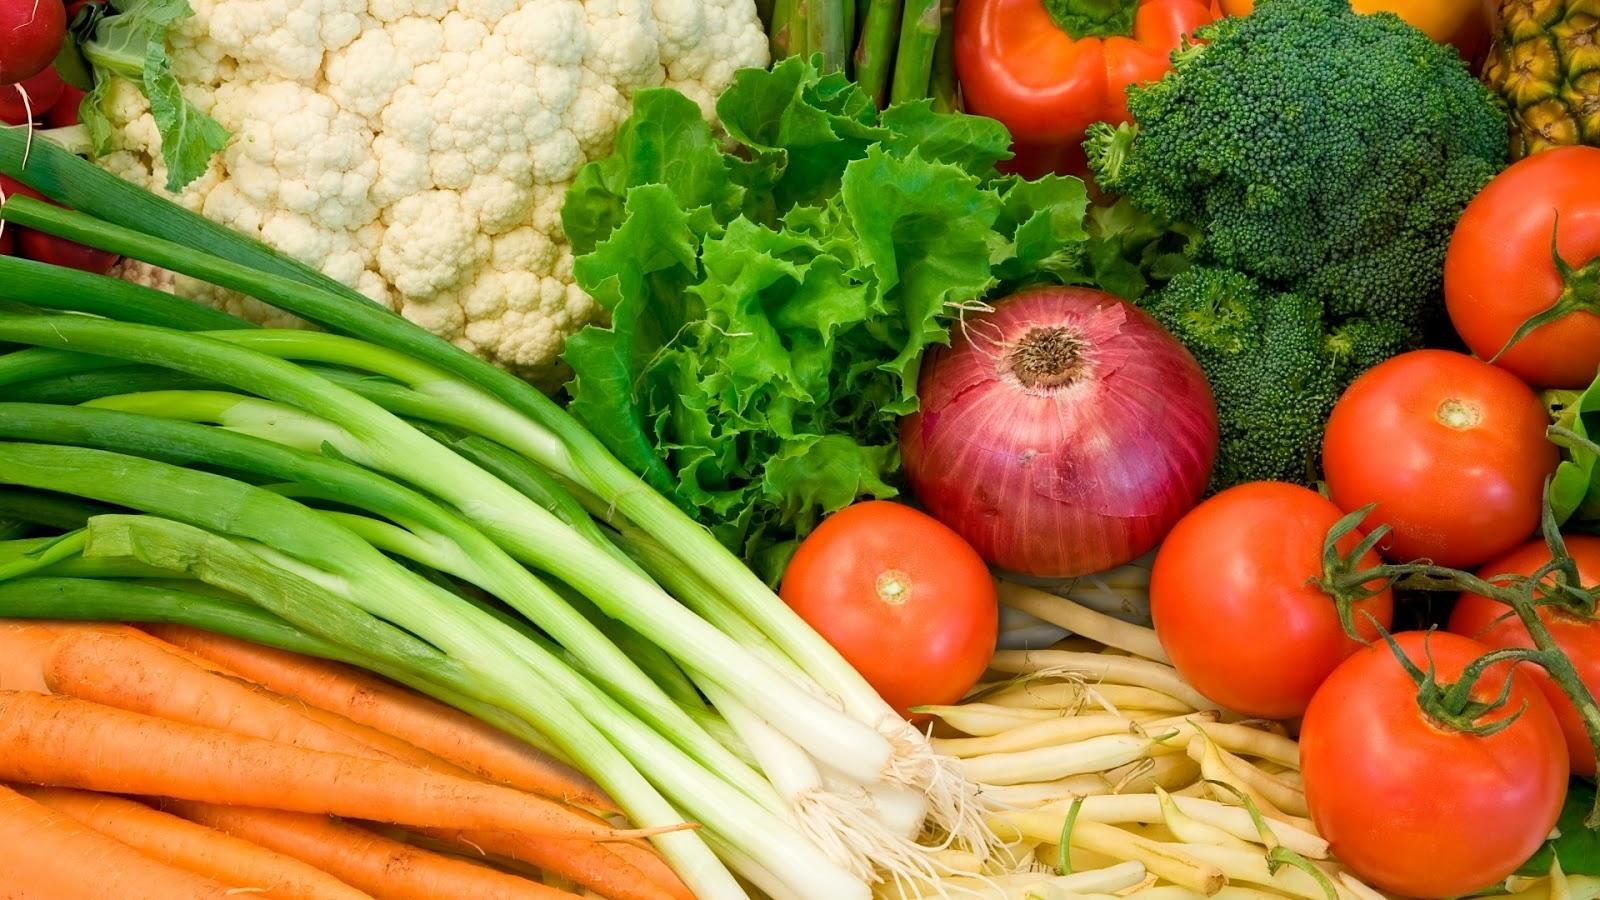 http://2.bp.blogspot.com/-jOvXWVf3q_E/Ug5h0y27qdI/AAAAAAAAKCs/_wHWntAGiHI/s1600/vegetables-fruits.jpg